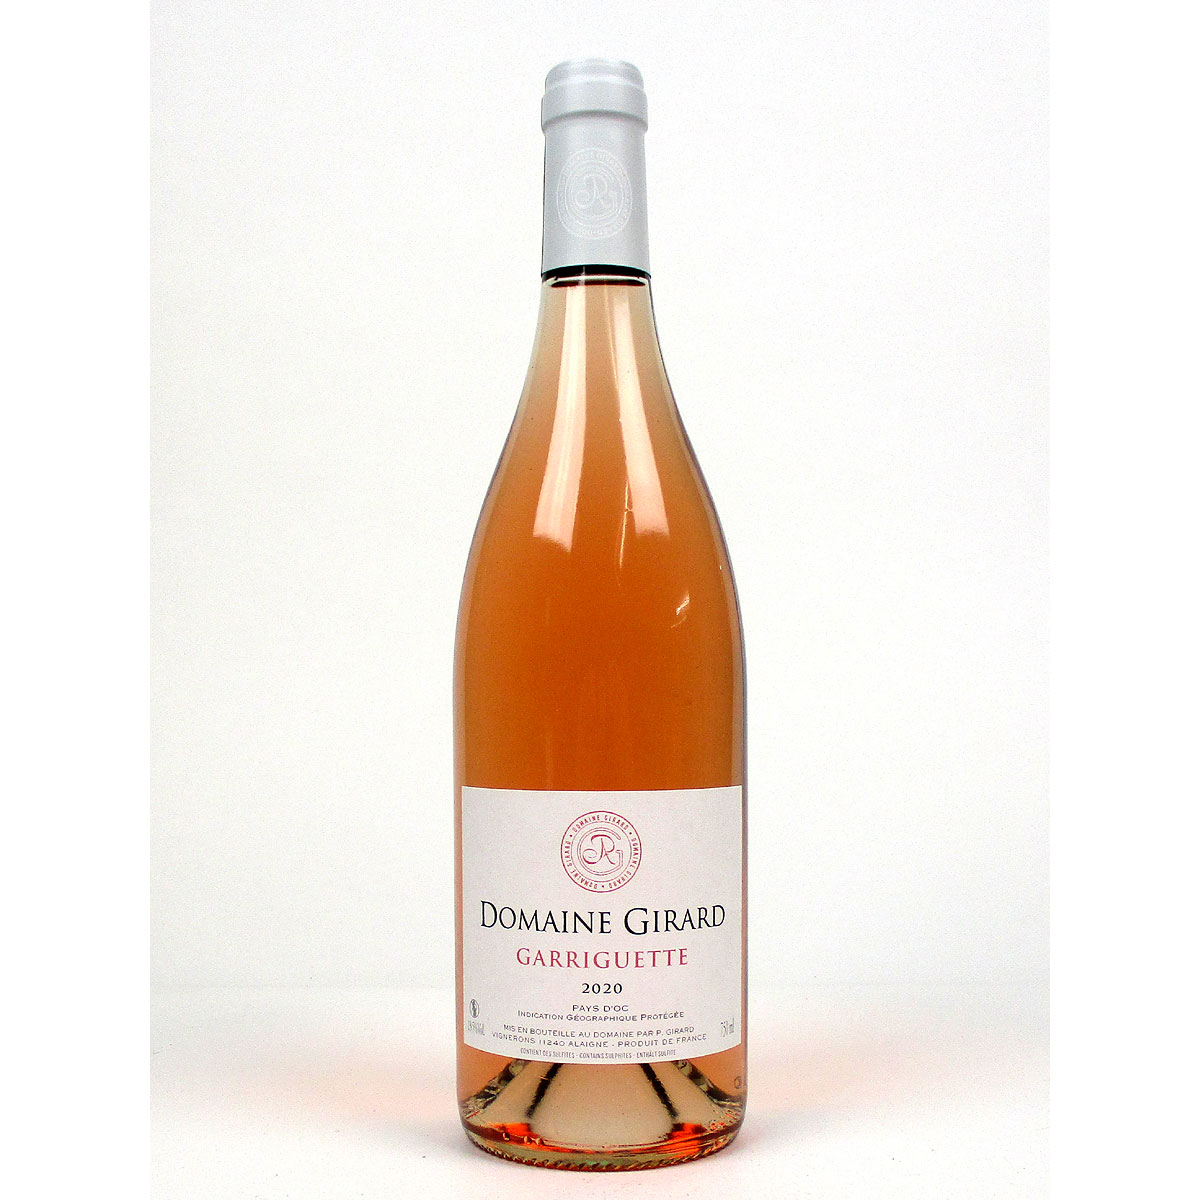 IGP Pays d'Oc: Domaine Girard 'Garriguette' Rosé 2020 - Bottle